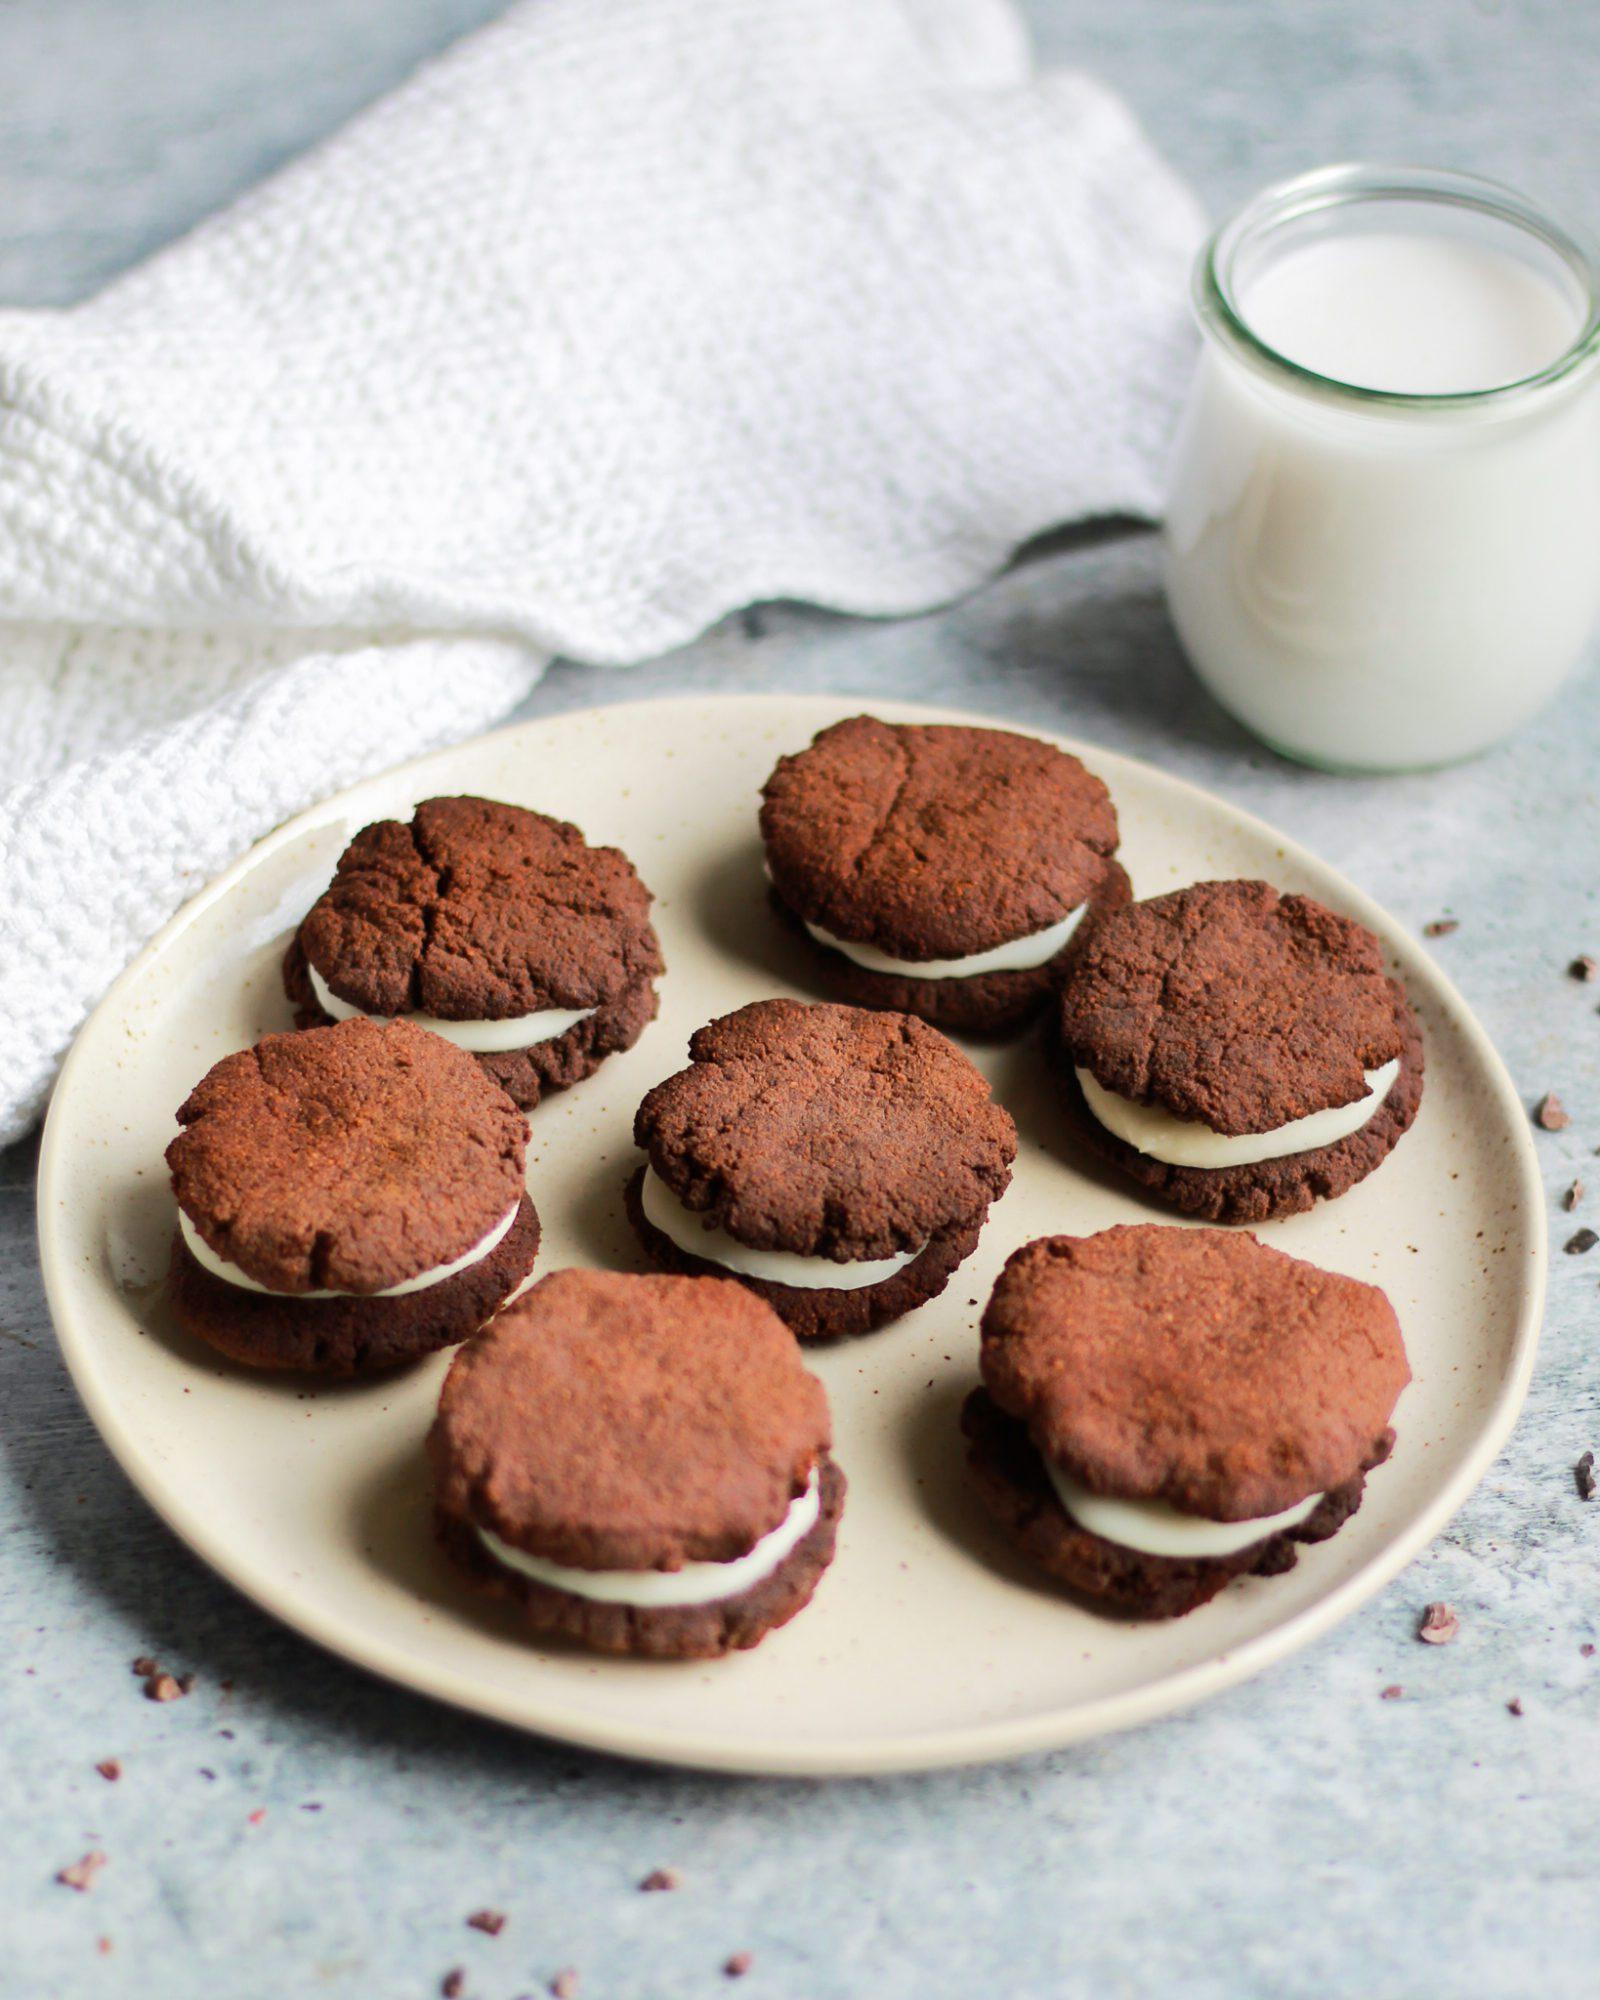 plate of paleo vegan oreos on a plate next to almond milk